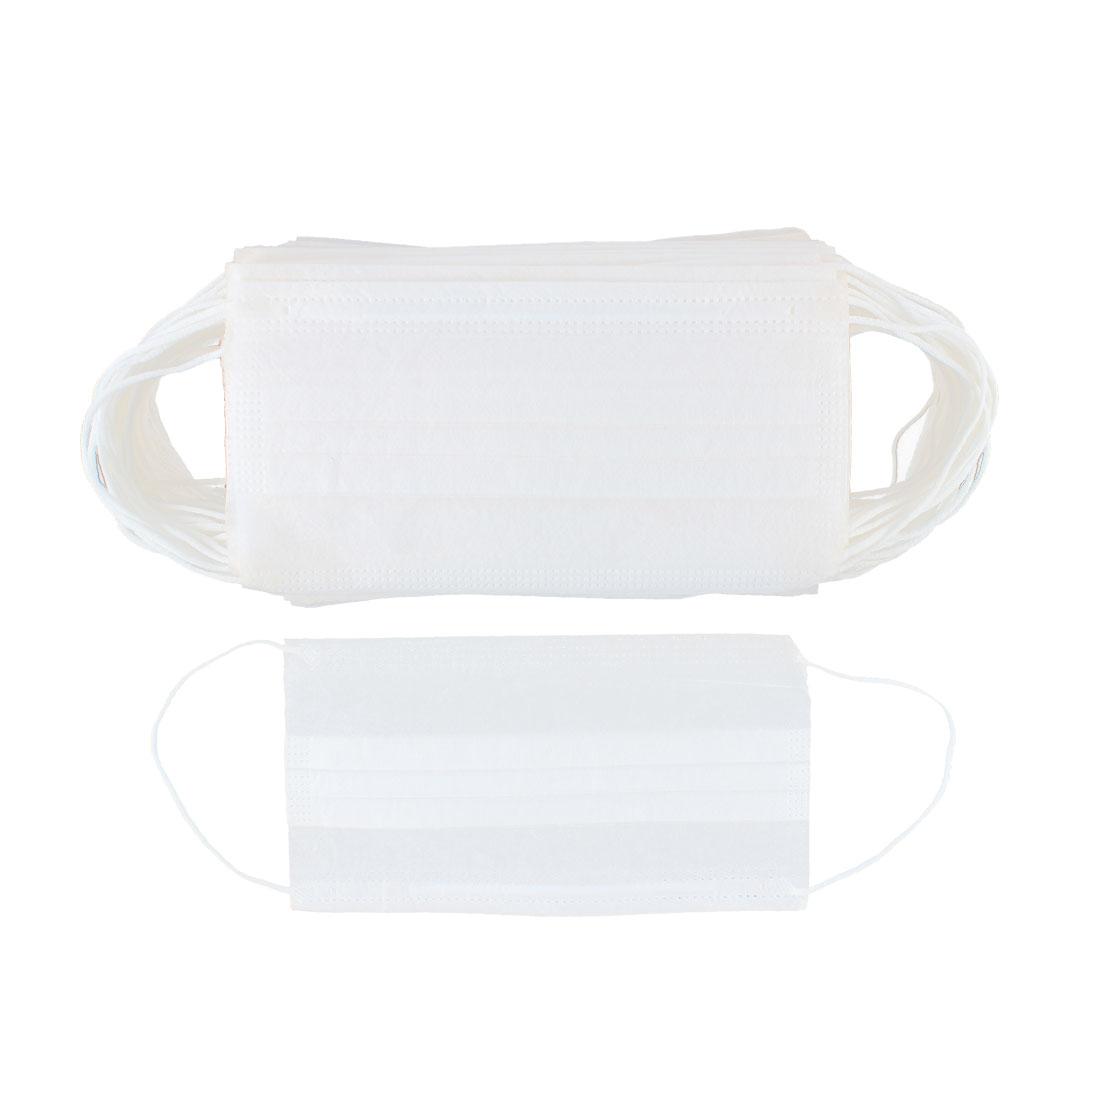 Disposable Oral Surgery Mouth Face Masks White 50Pcs